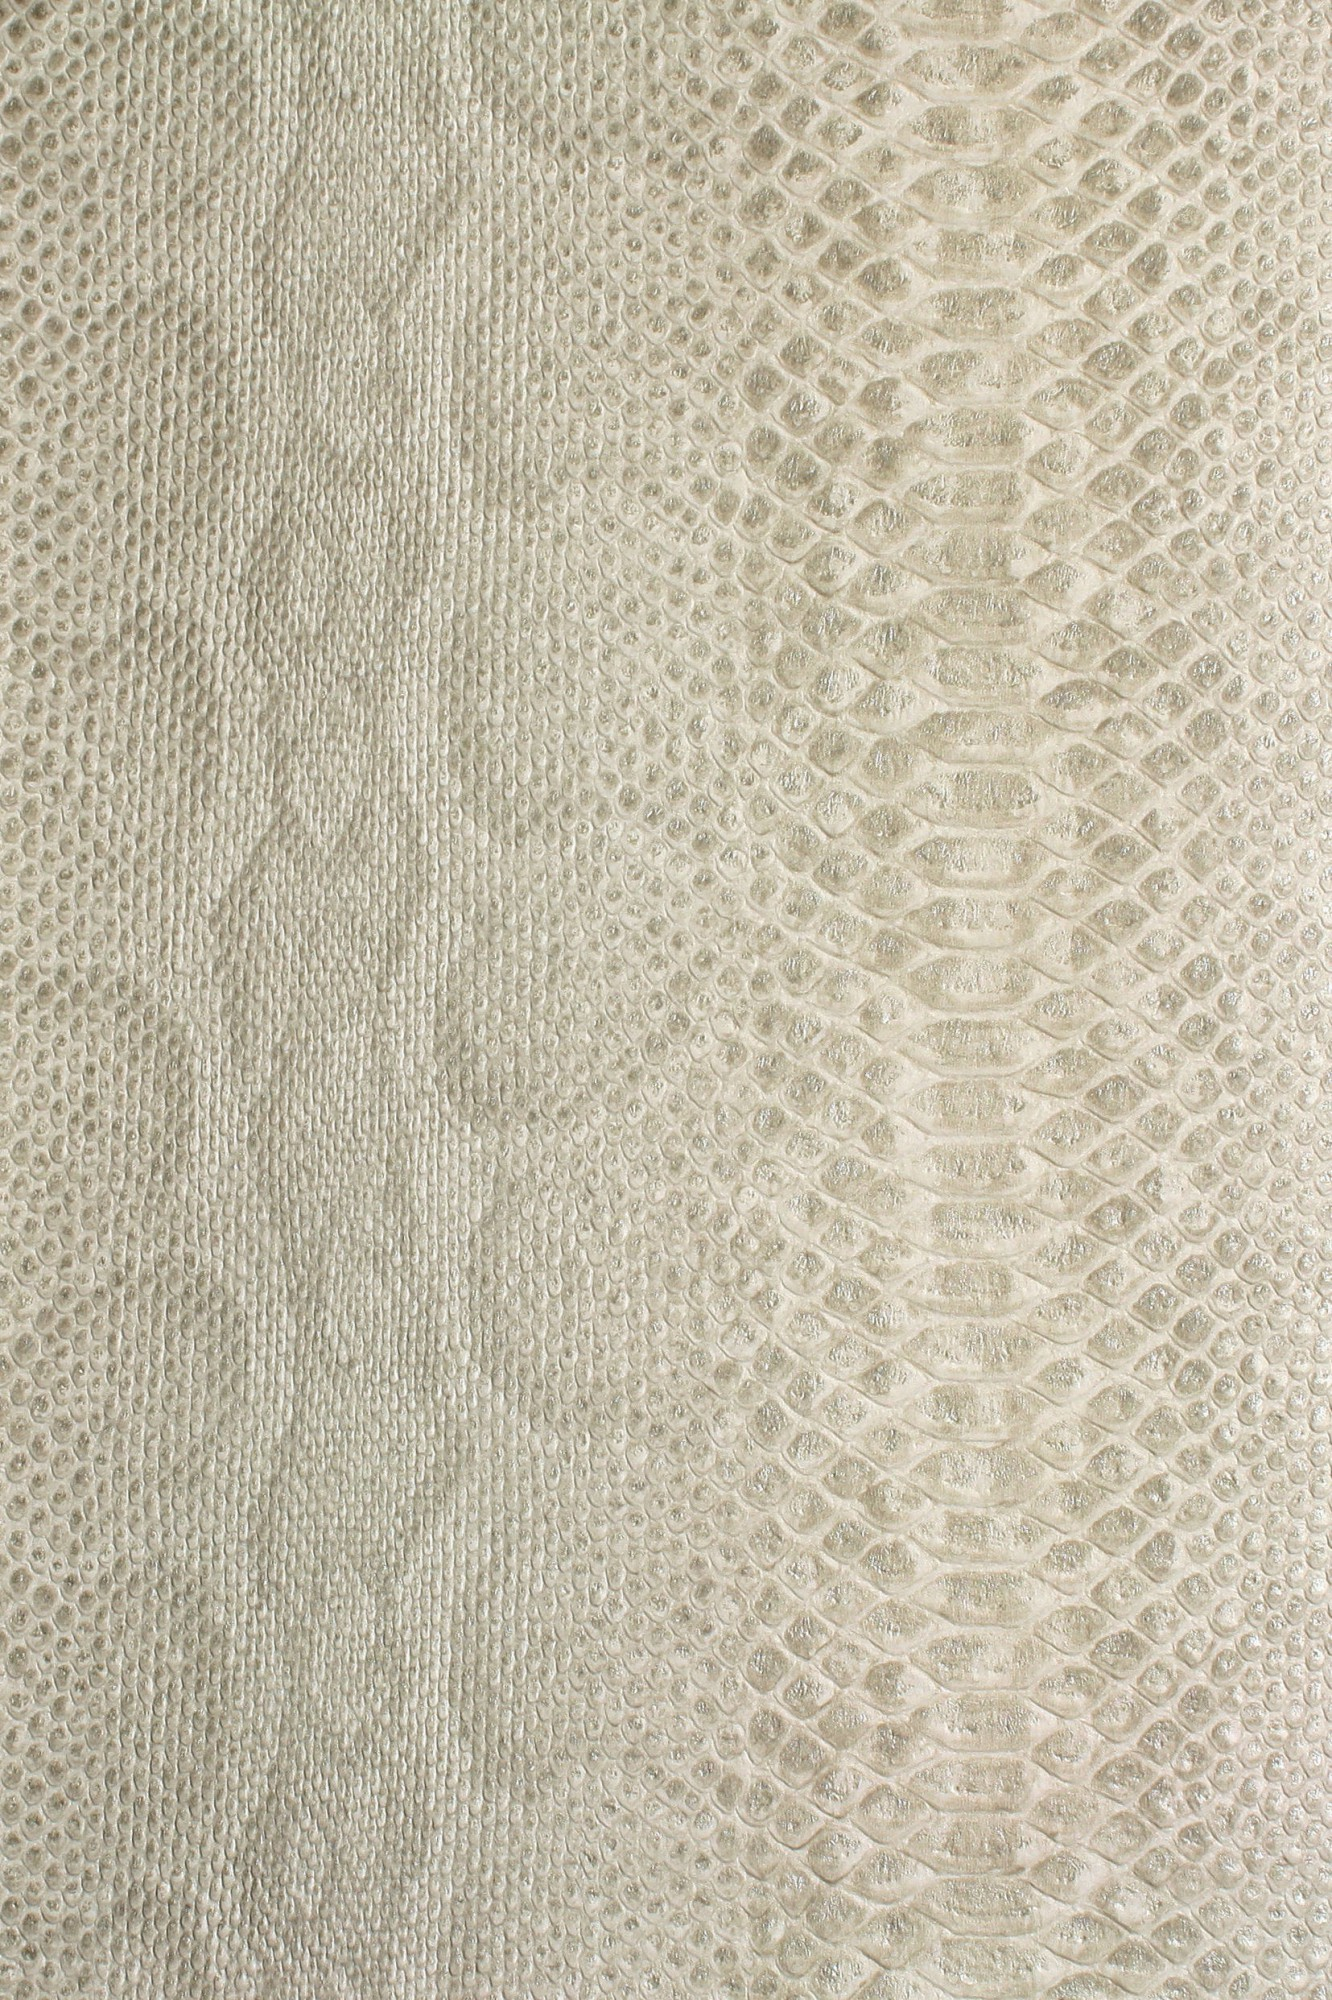 b b home passion 3 tapete becker vliestapete 453324 afrika schlange beige. Black Bedroom Furniture Sets. Home Design Ideas